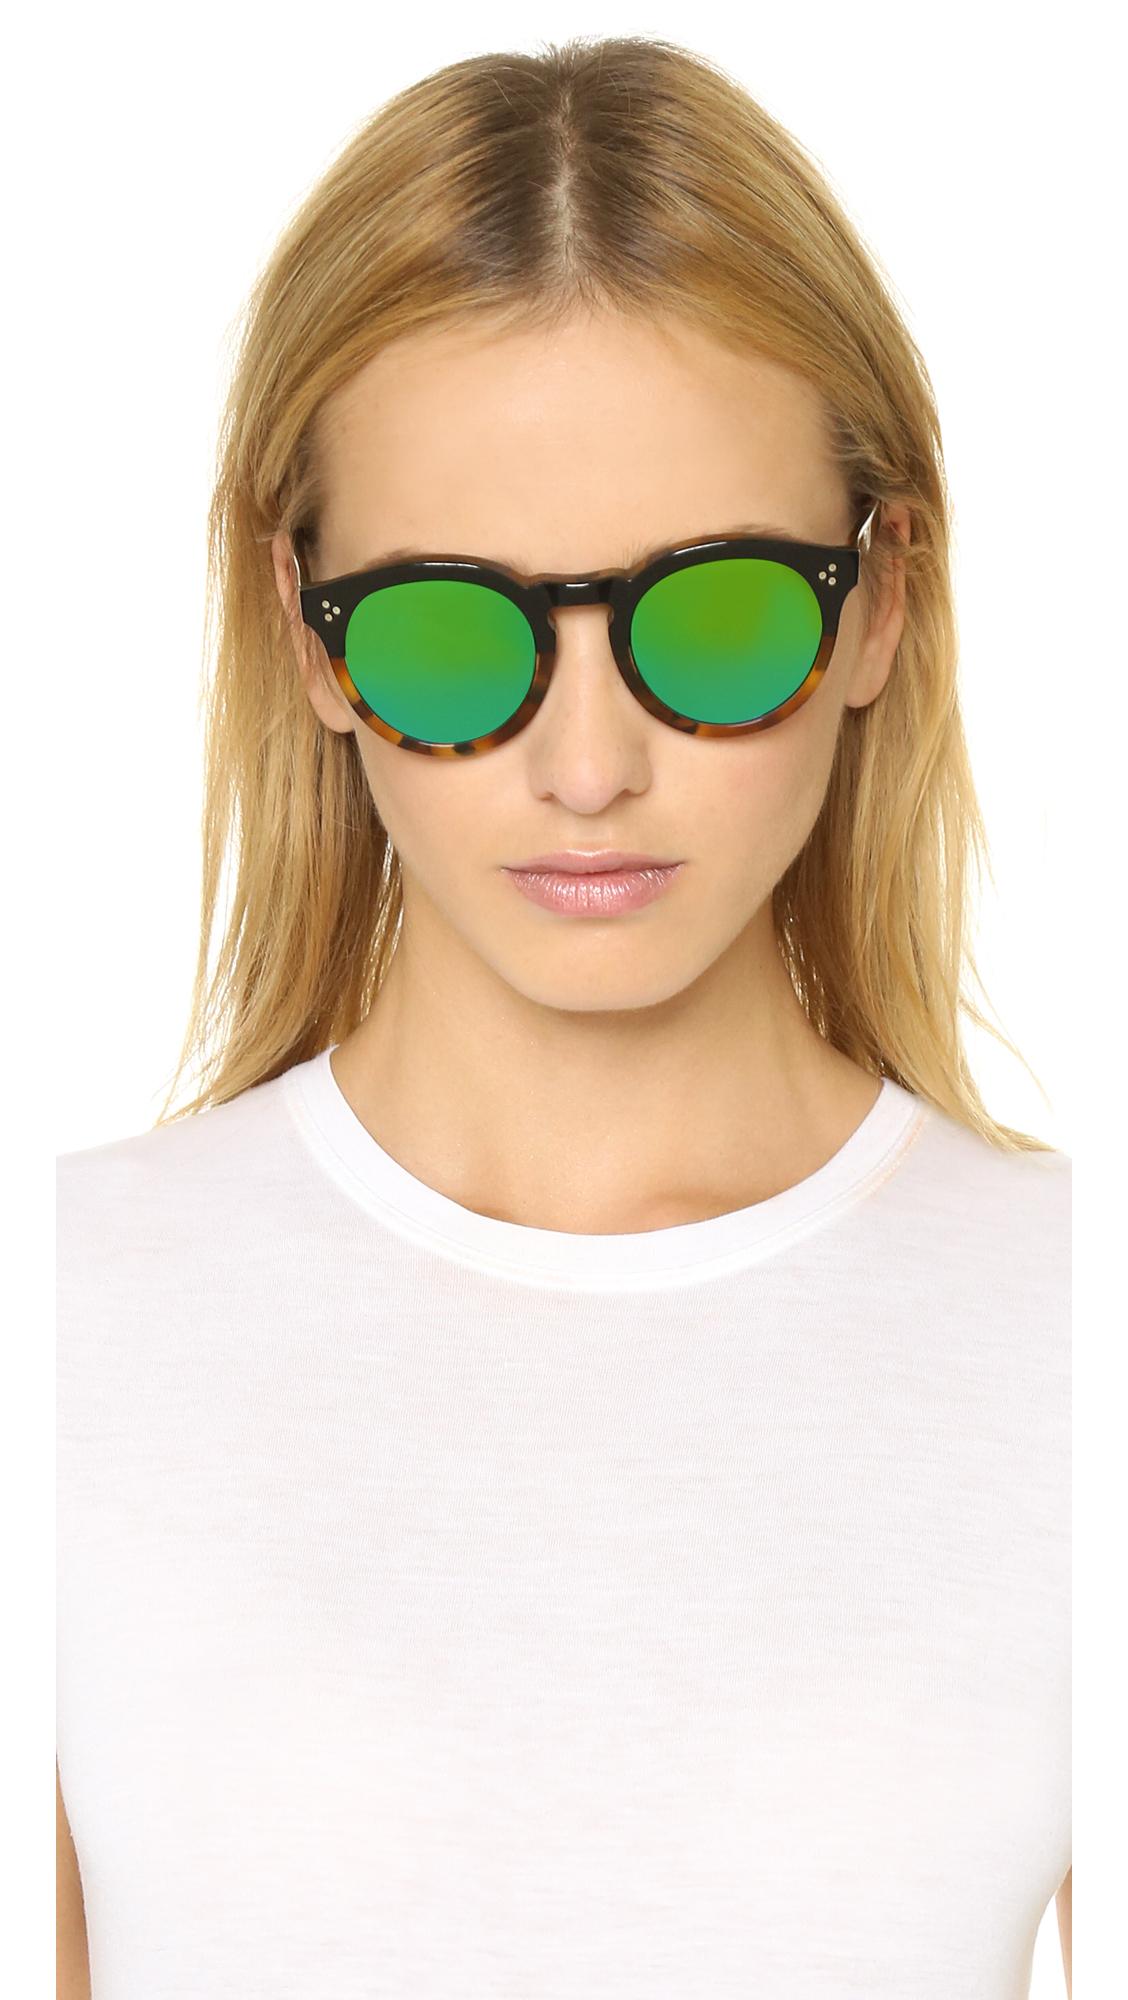 2e0657ef903 Lyst - Illesteva Leonard Ii Half And Half Mirrored Sunglasses - Black Light  Tortoise green in Black